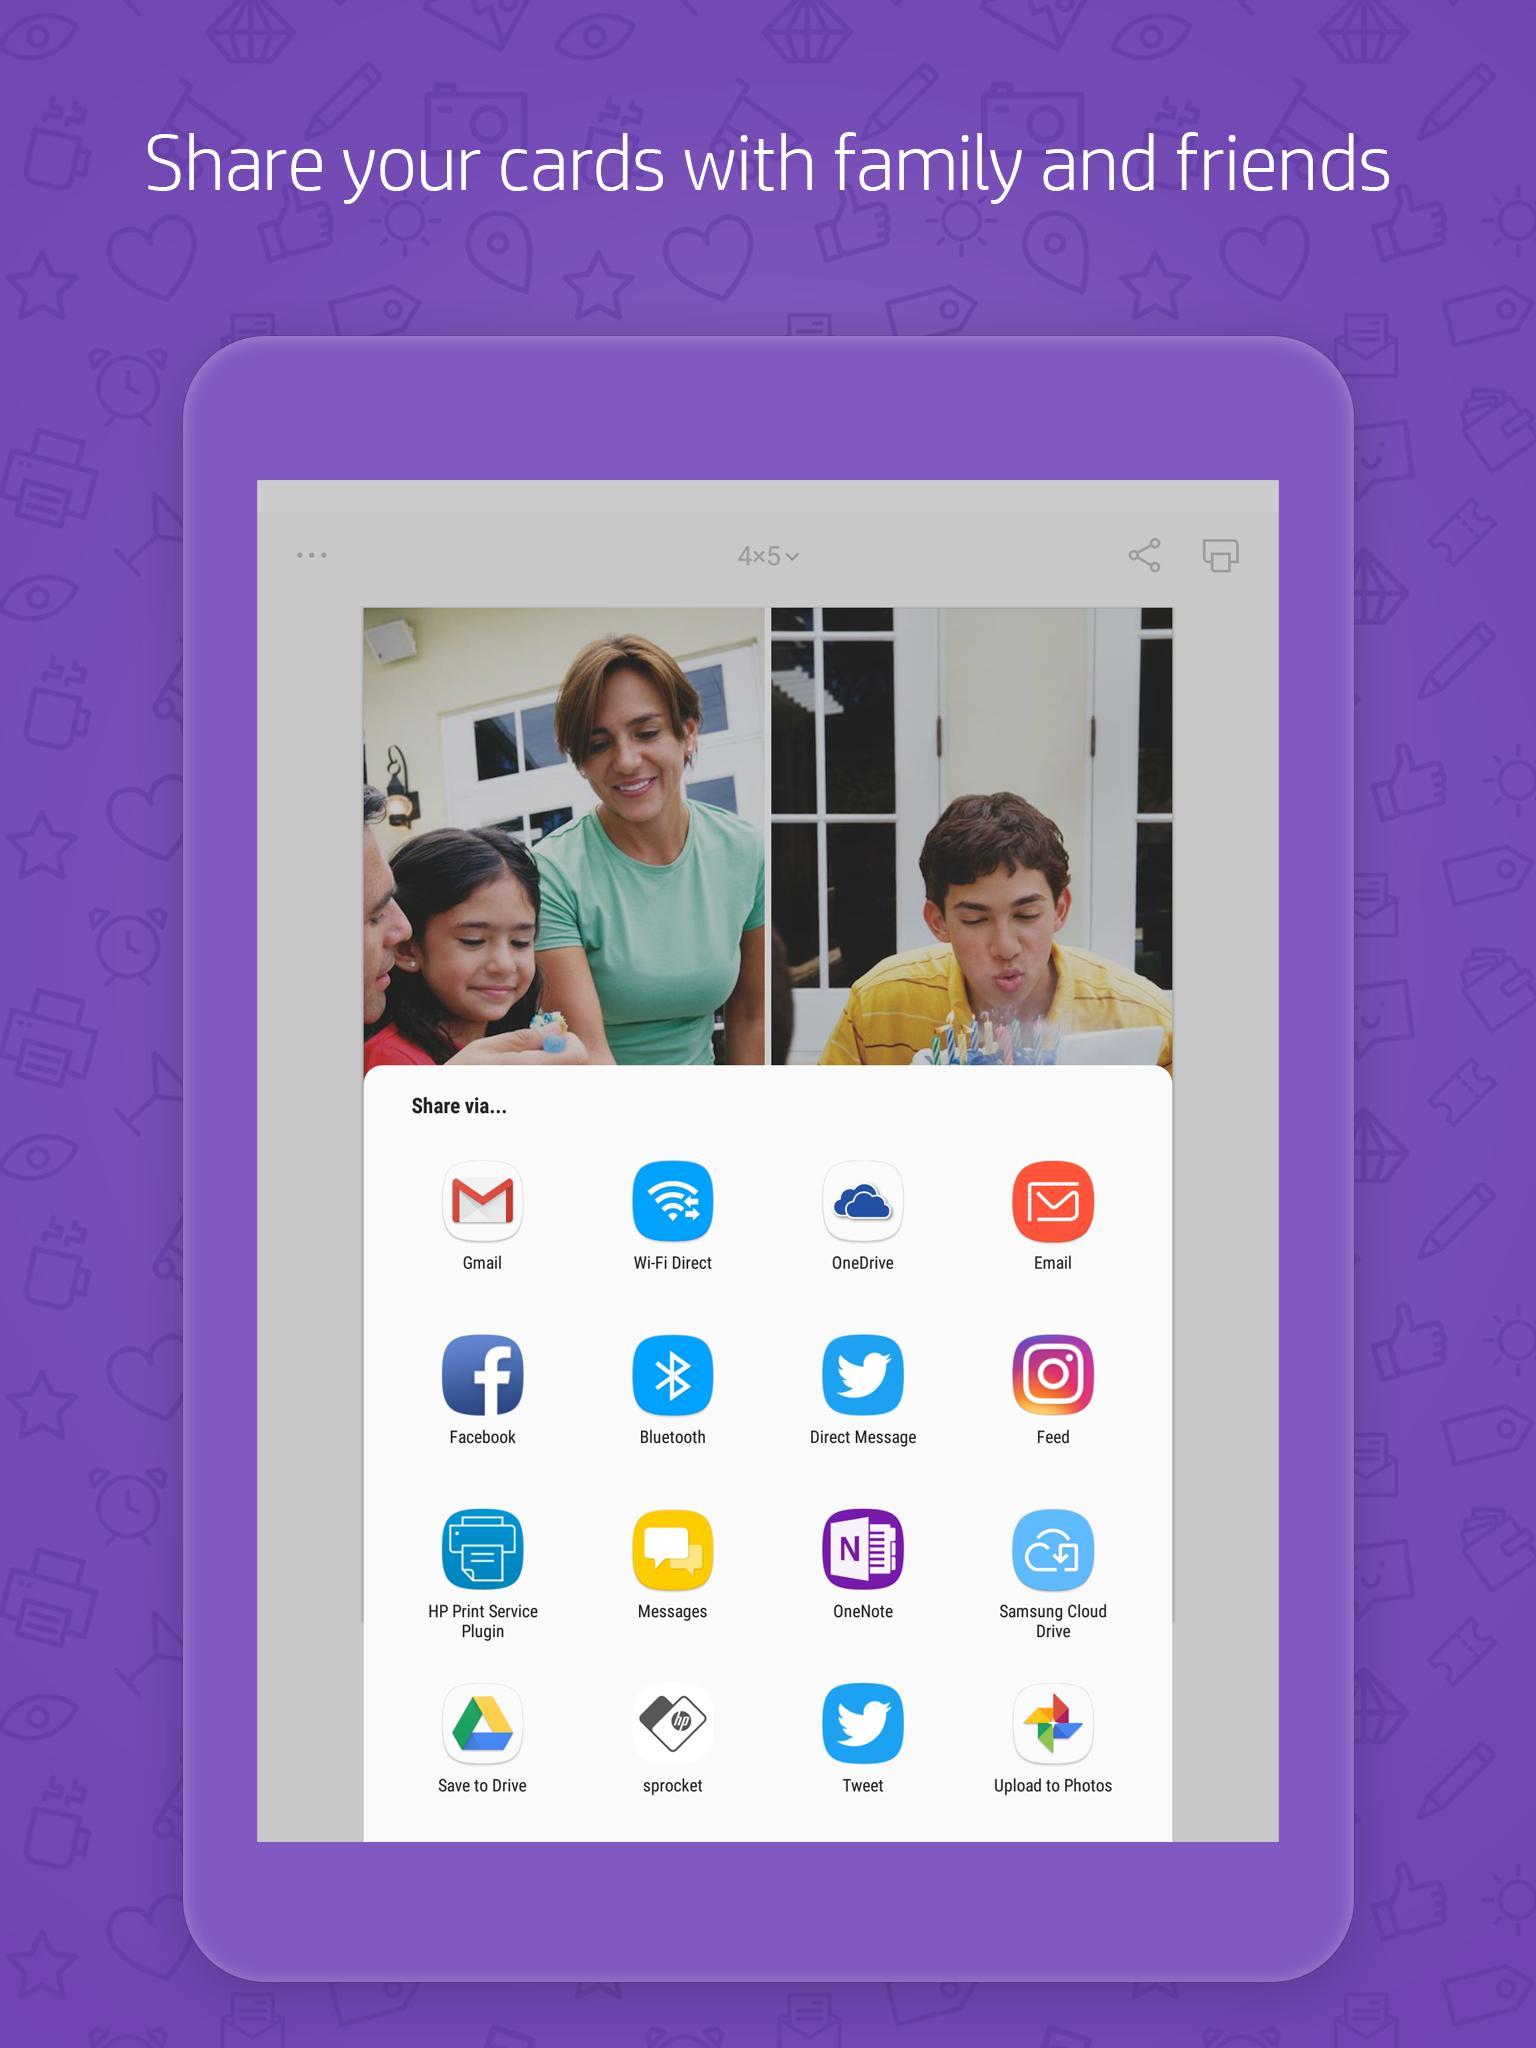 28+ Hp Social Media Snapshots App Ios Wallpapers